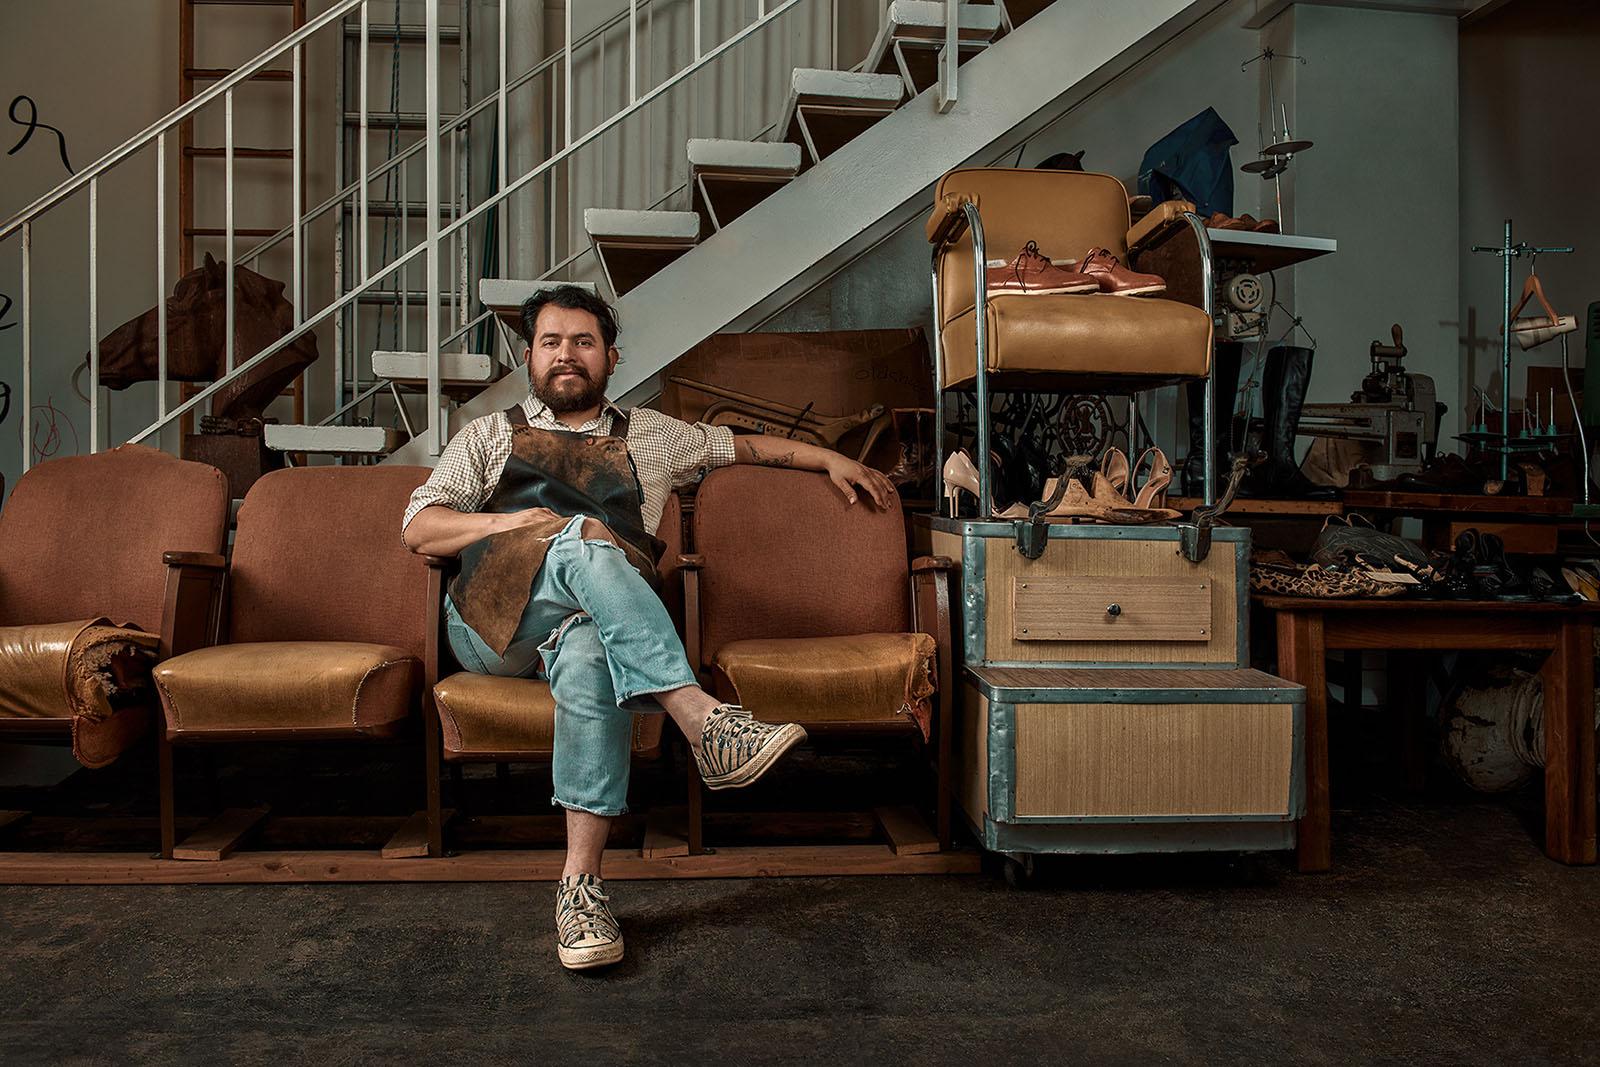 The Bespoke Shoe Maker